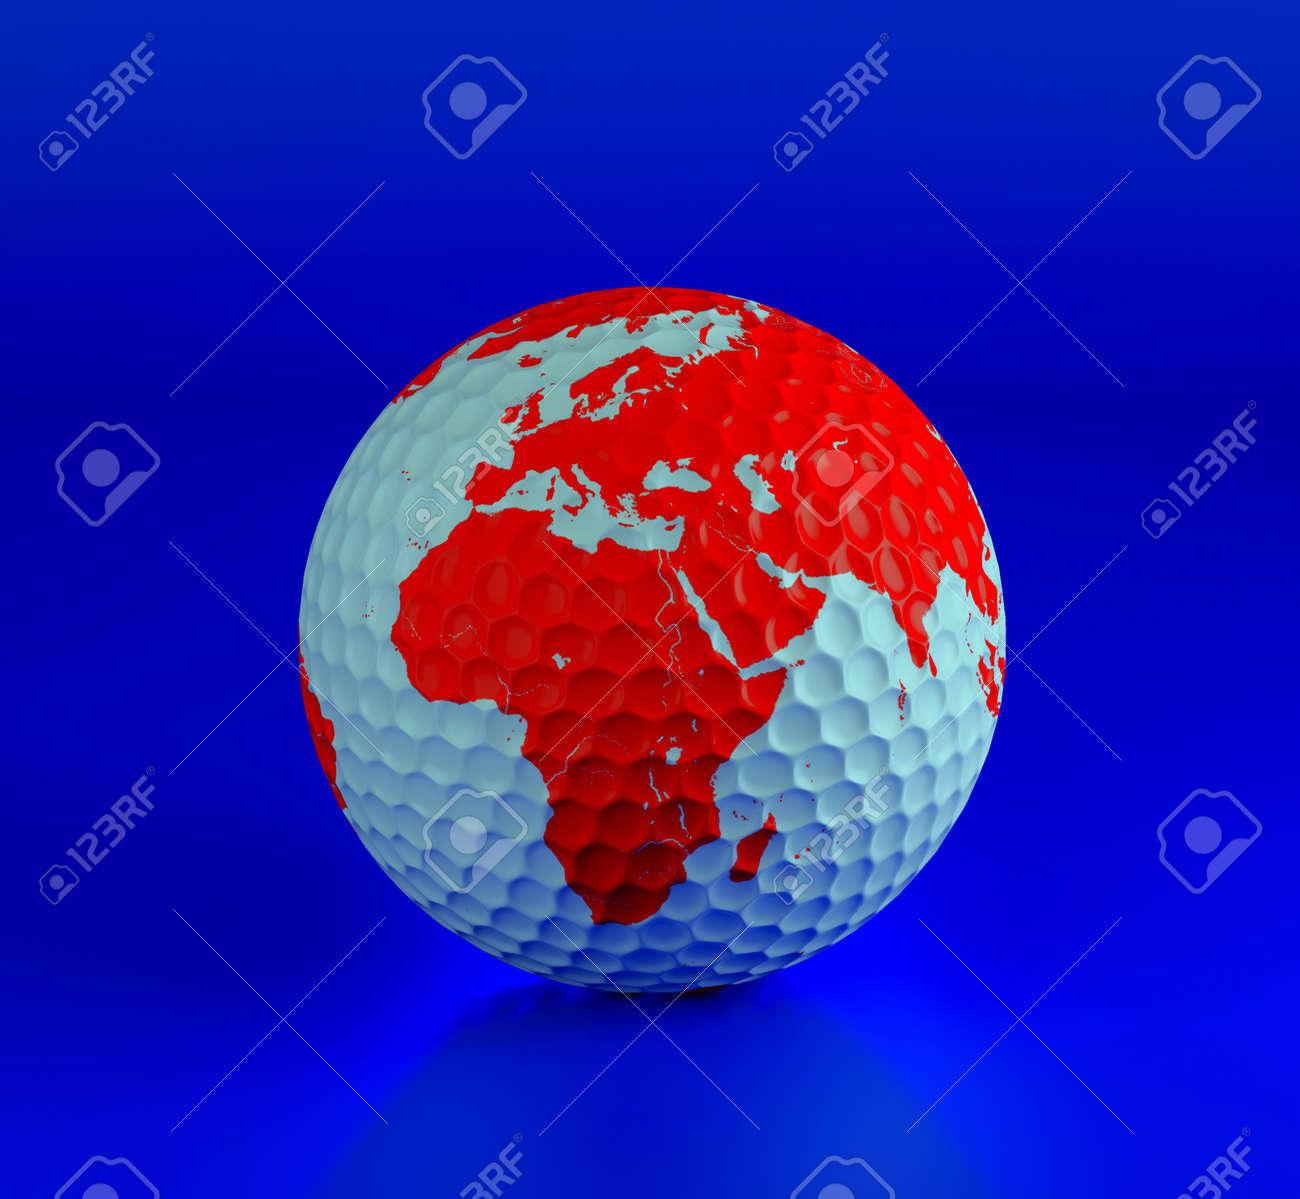 Golf ball isolated on blue. 3d illustration. High resolution image. Stock Illustration - 6987406